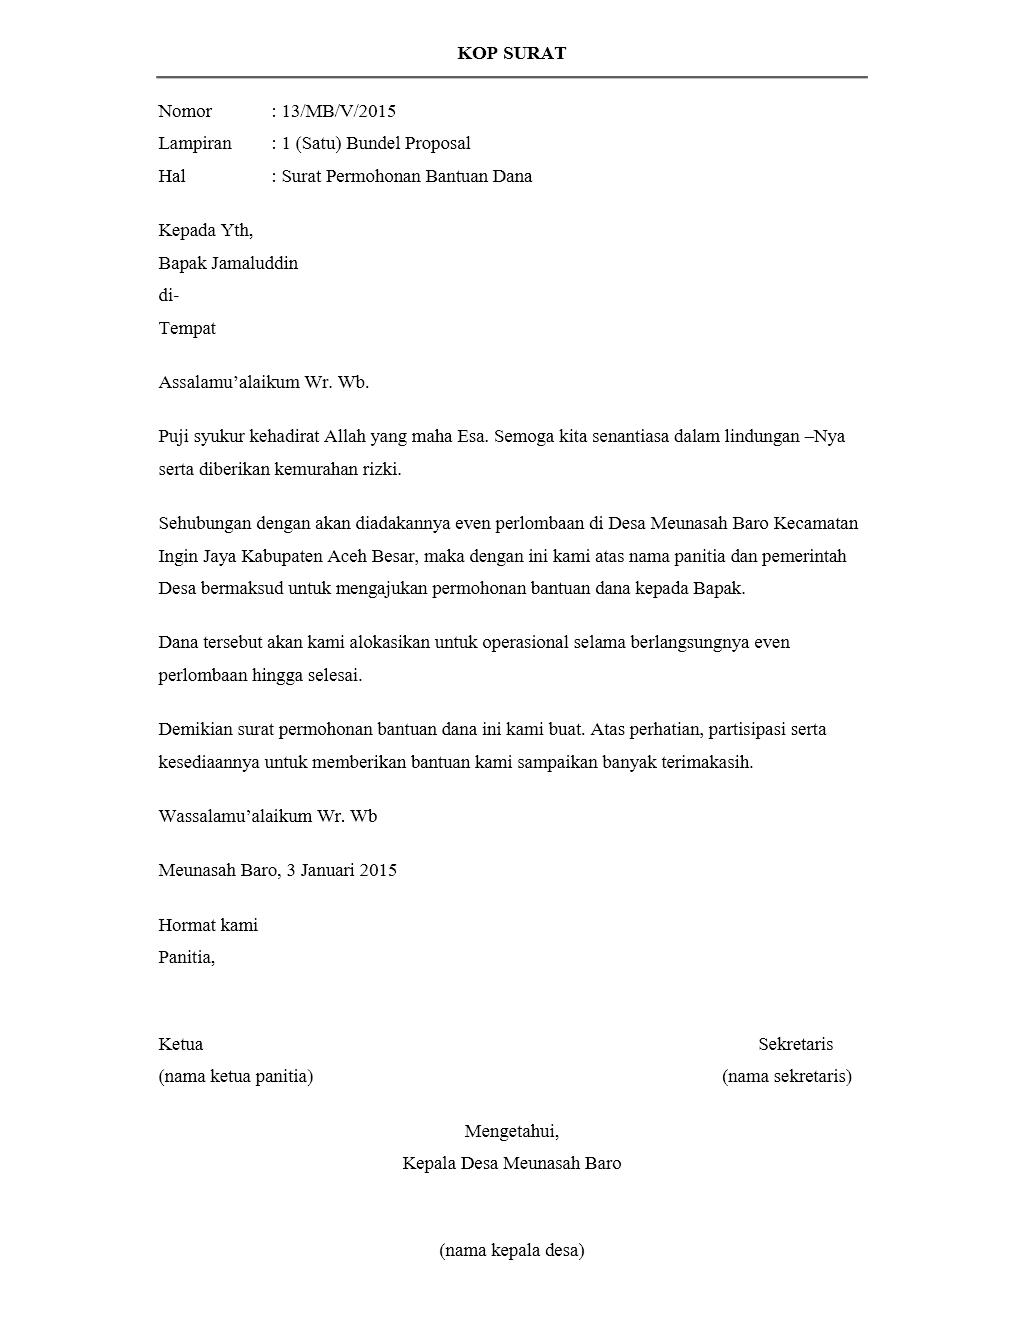 Contoh Surat Permohonan Bantuan Dana Proposal : contoh, surat, permohonan, bantuan, proposal, Contoh, Surat, Pengantar, Proposal, Resmi, Benar, Kumpulan, CONTOH, SURAT